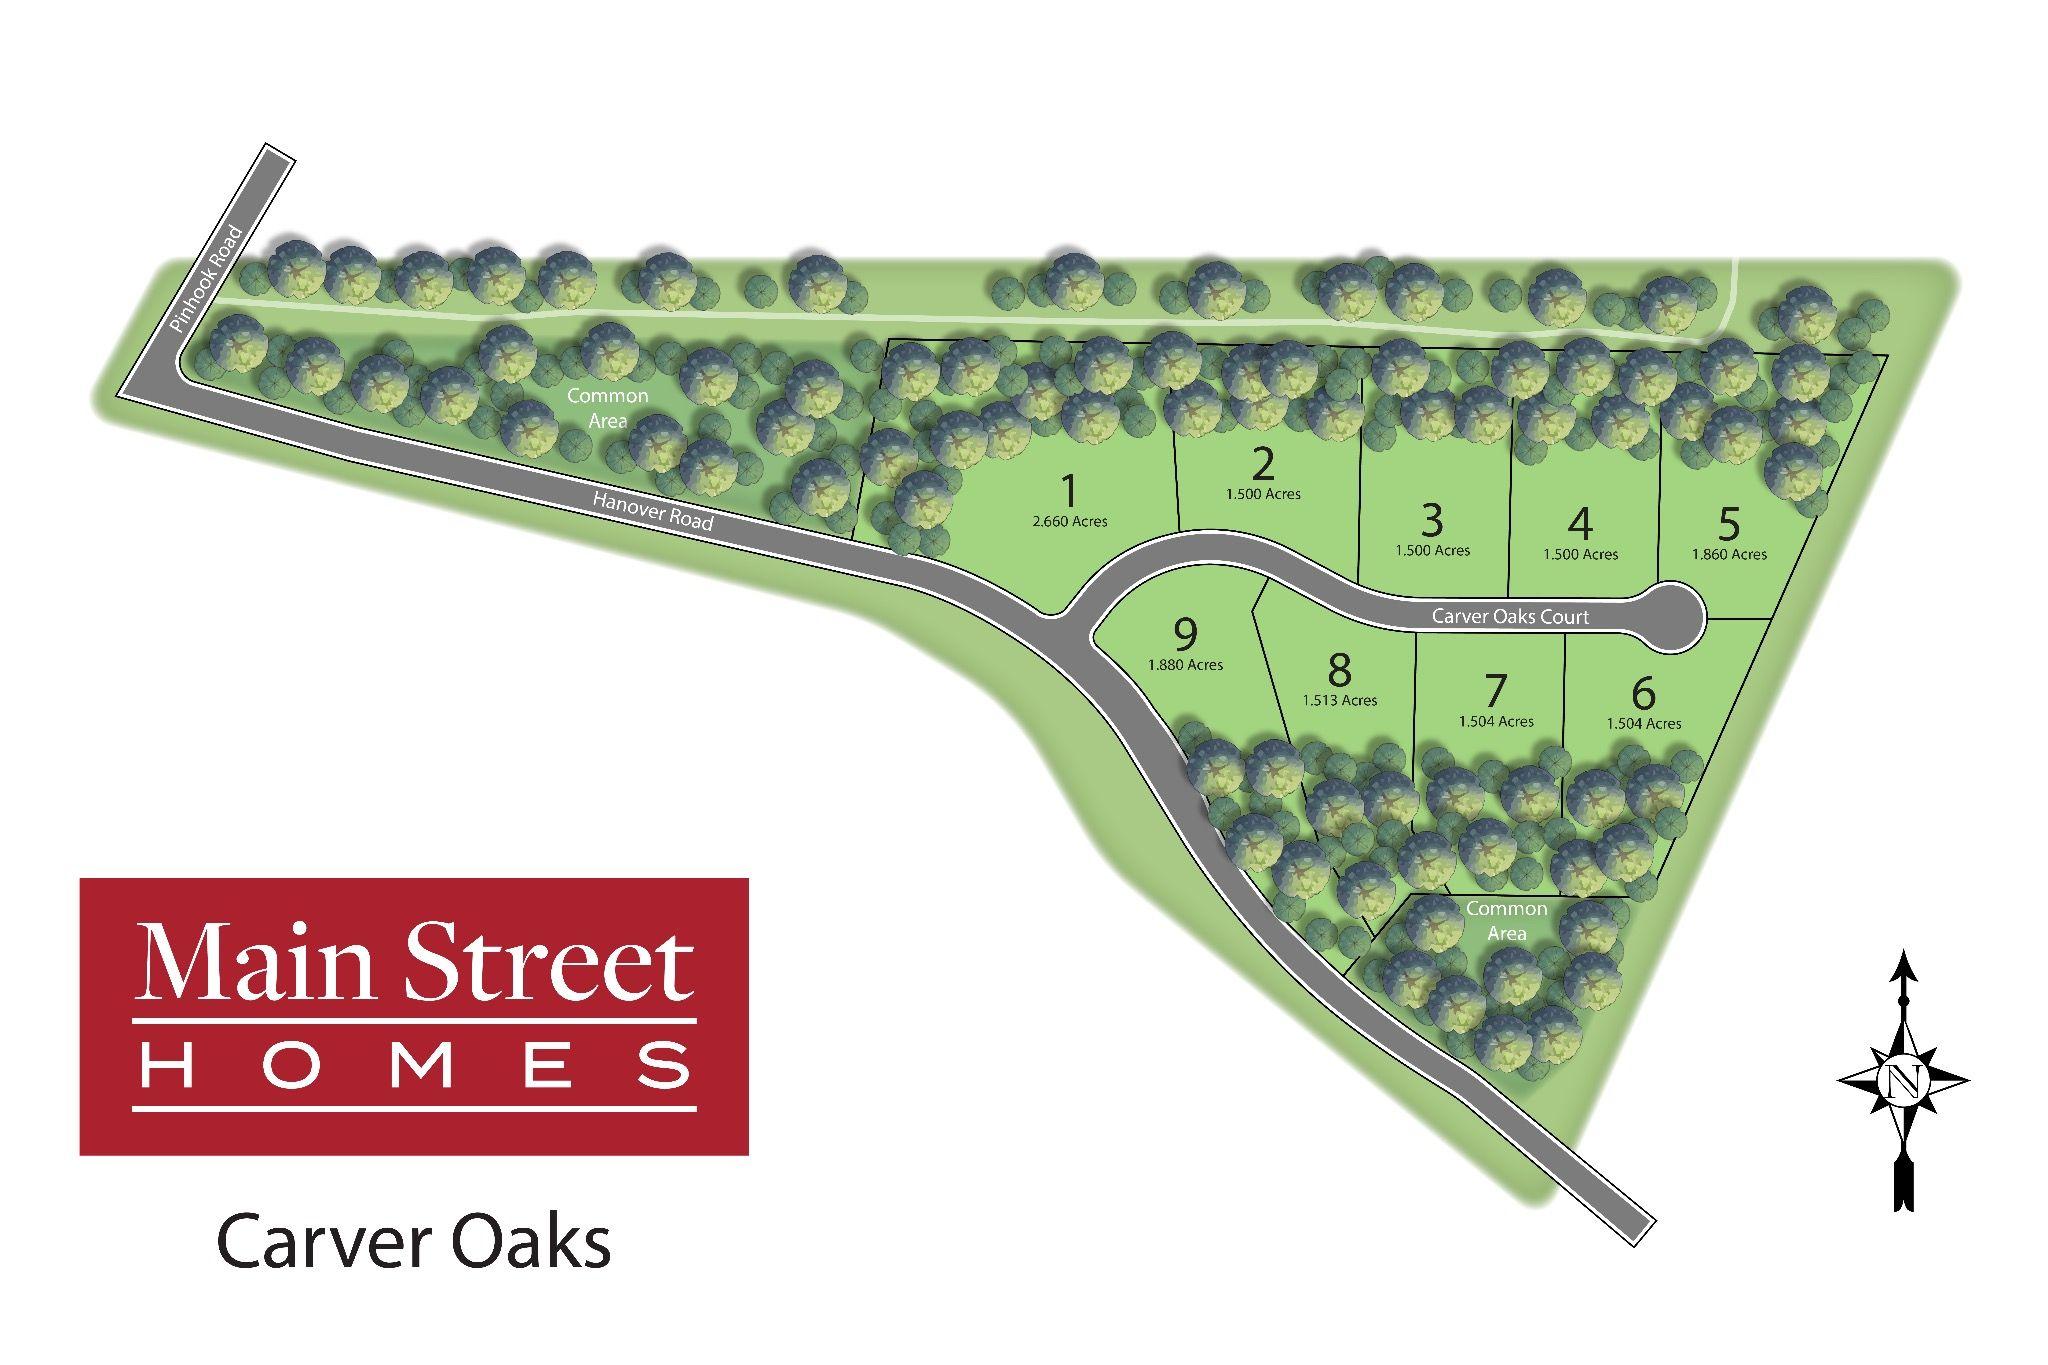 'Carver Oaks' by Main Street Homes in Richmond-Petersburg